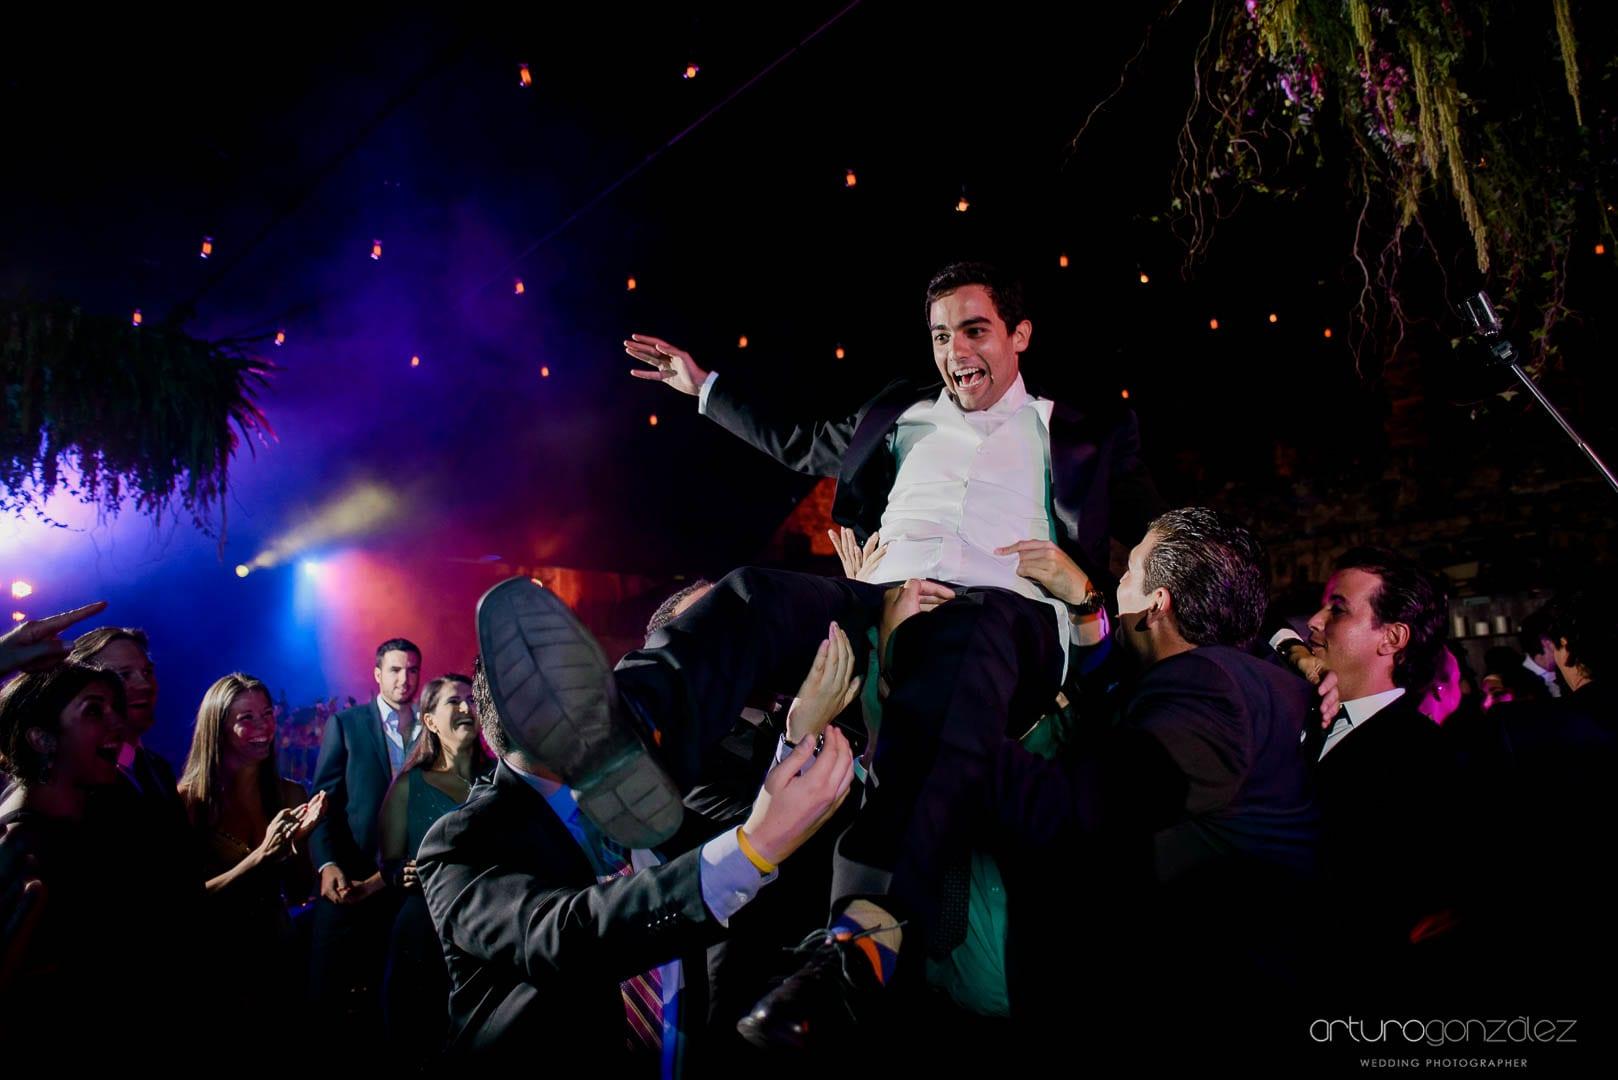 fotografo-de-bodas-en-guanajuato-122